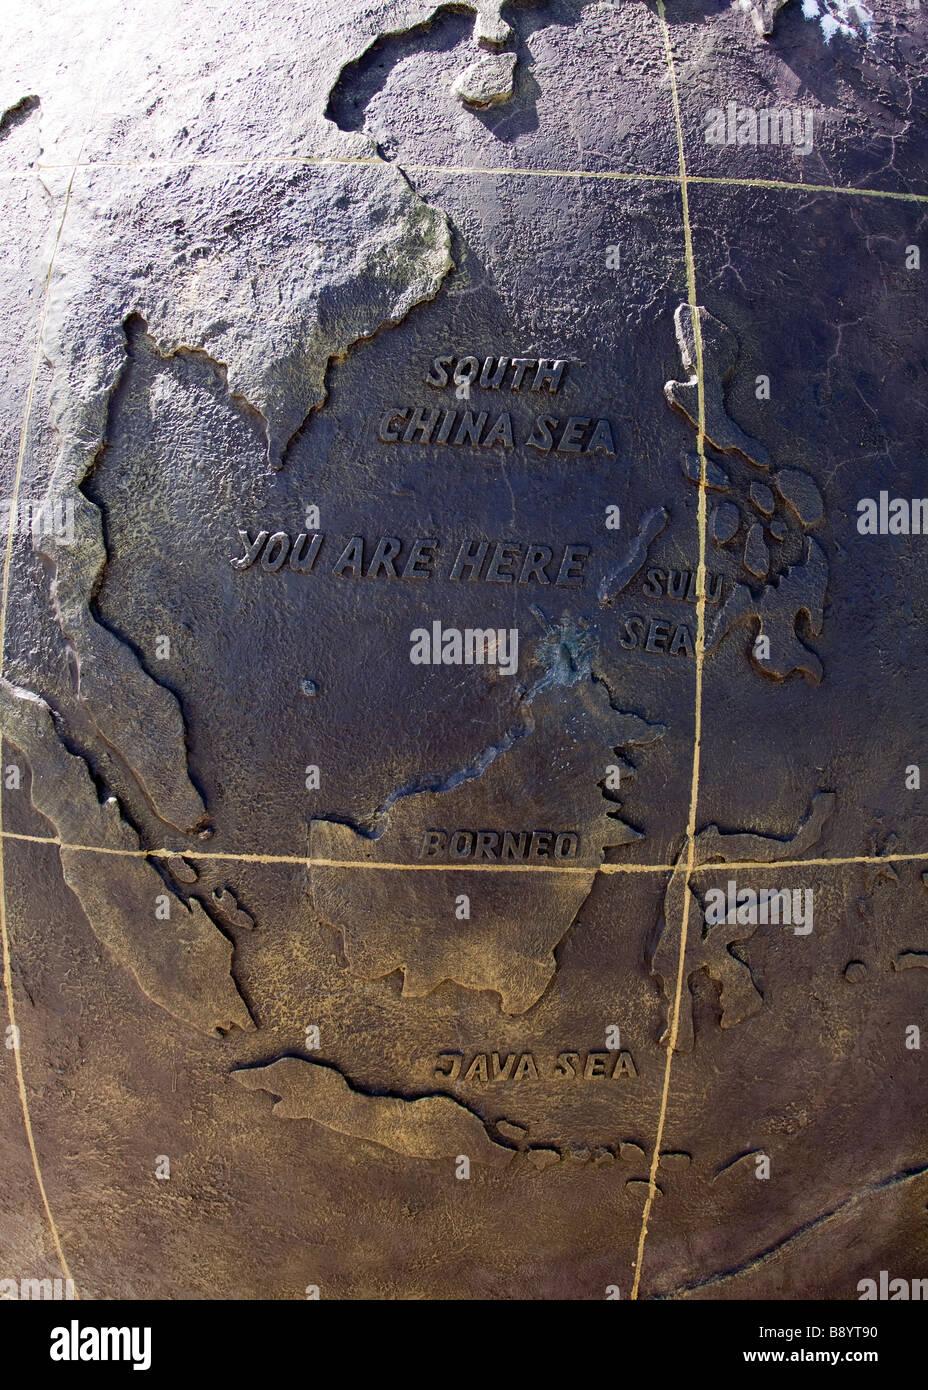 Map of Borneo stating 'You Are Here' at the Tip of Borneo Monument at Tanjung Simpang Mengayau Kudat Sabah - Stock Image